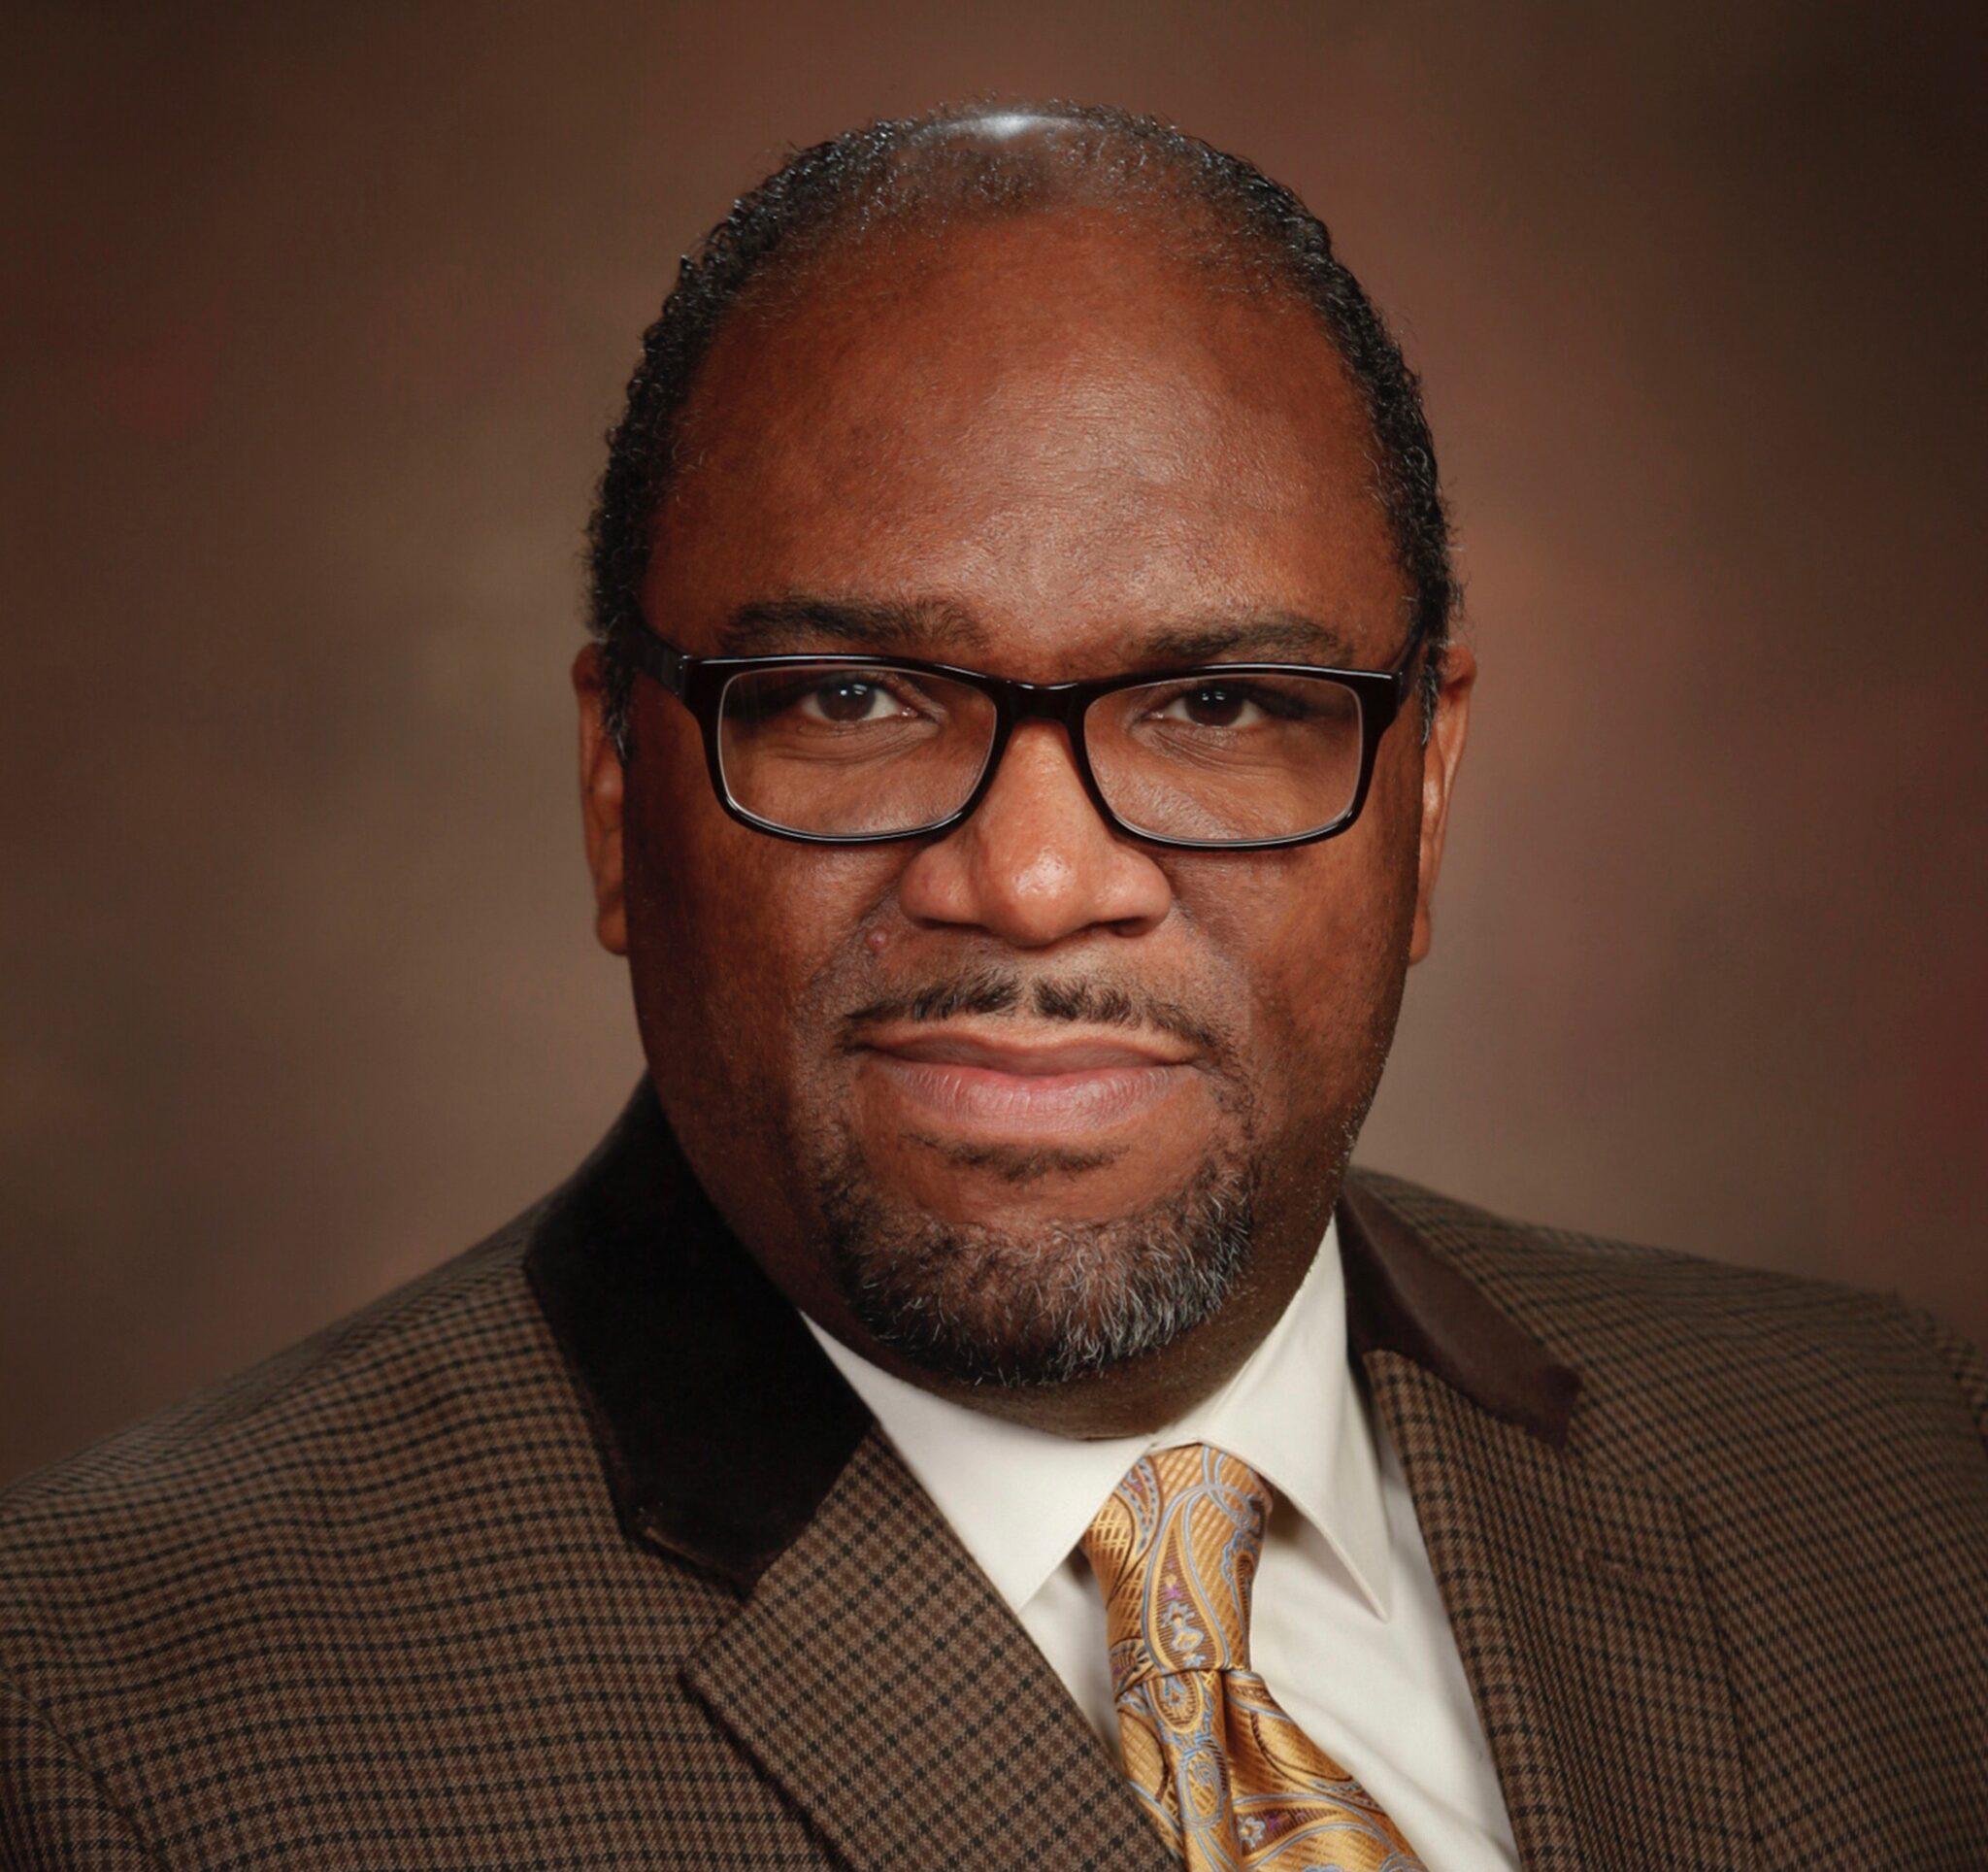 Birmingham pastor is honored as leader in the community